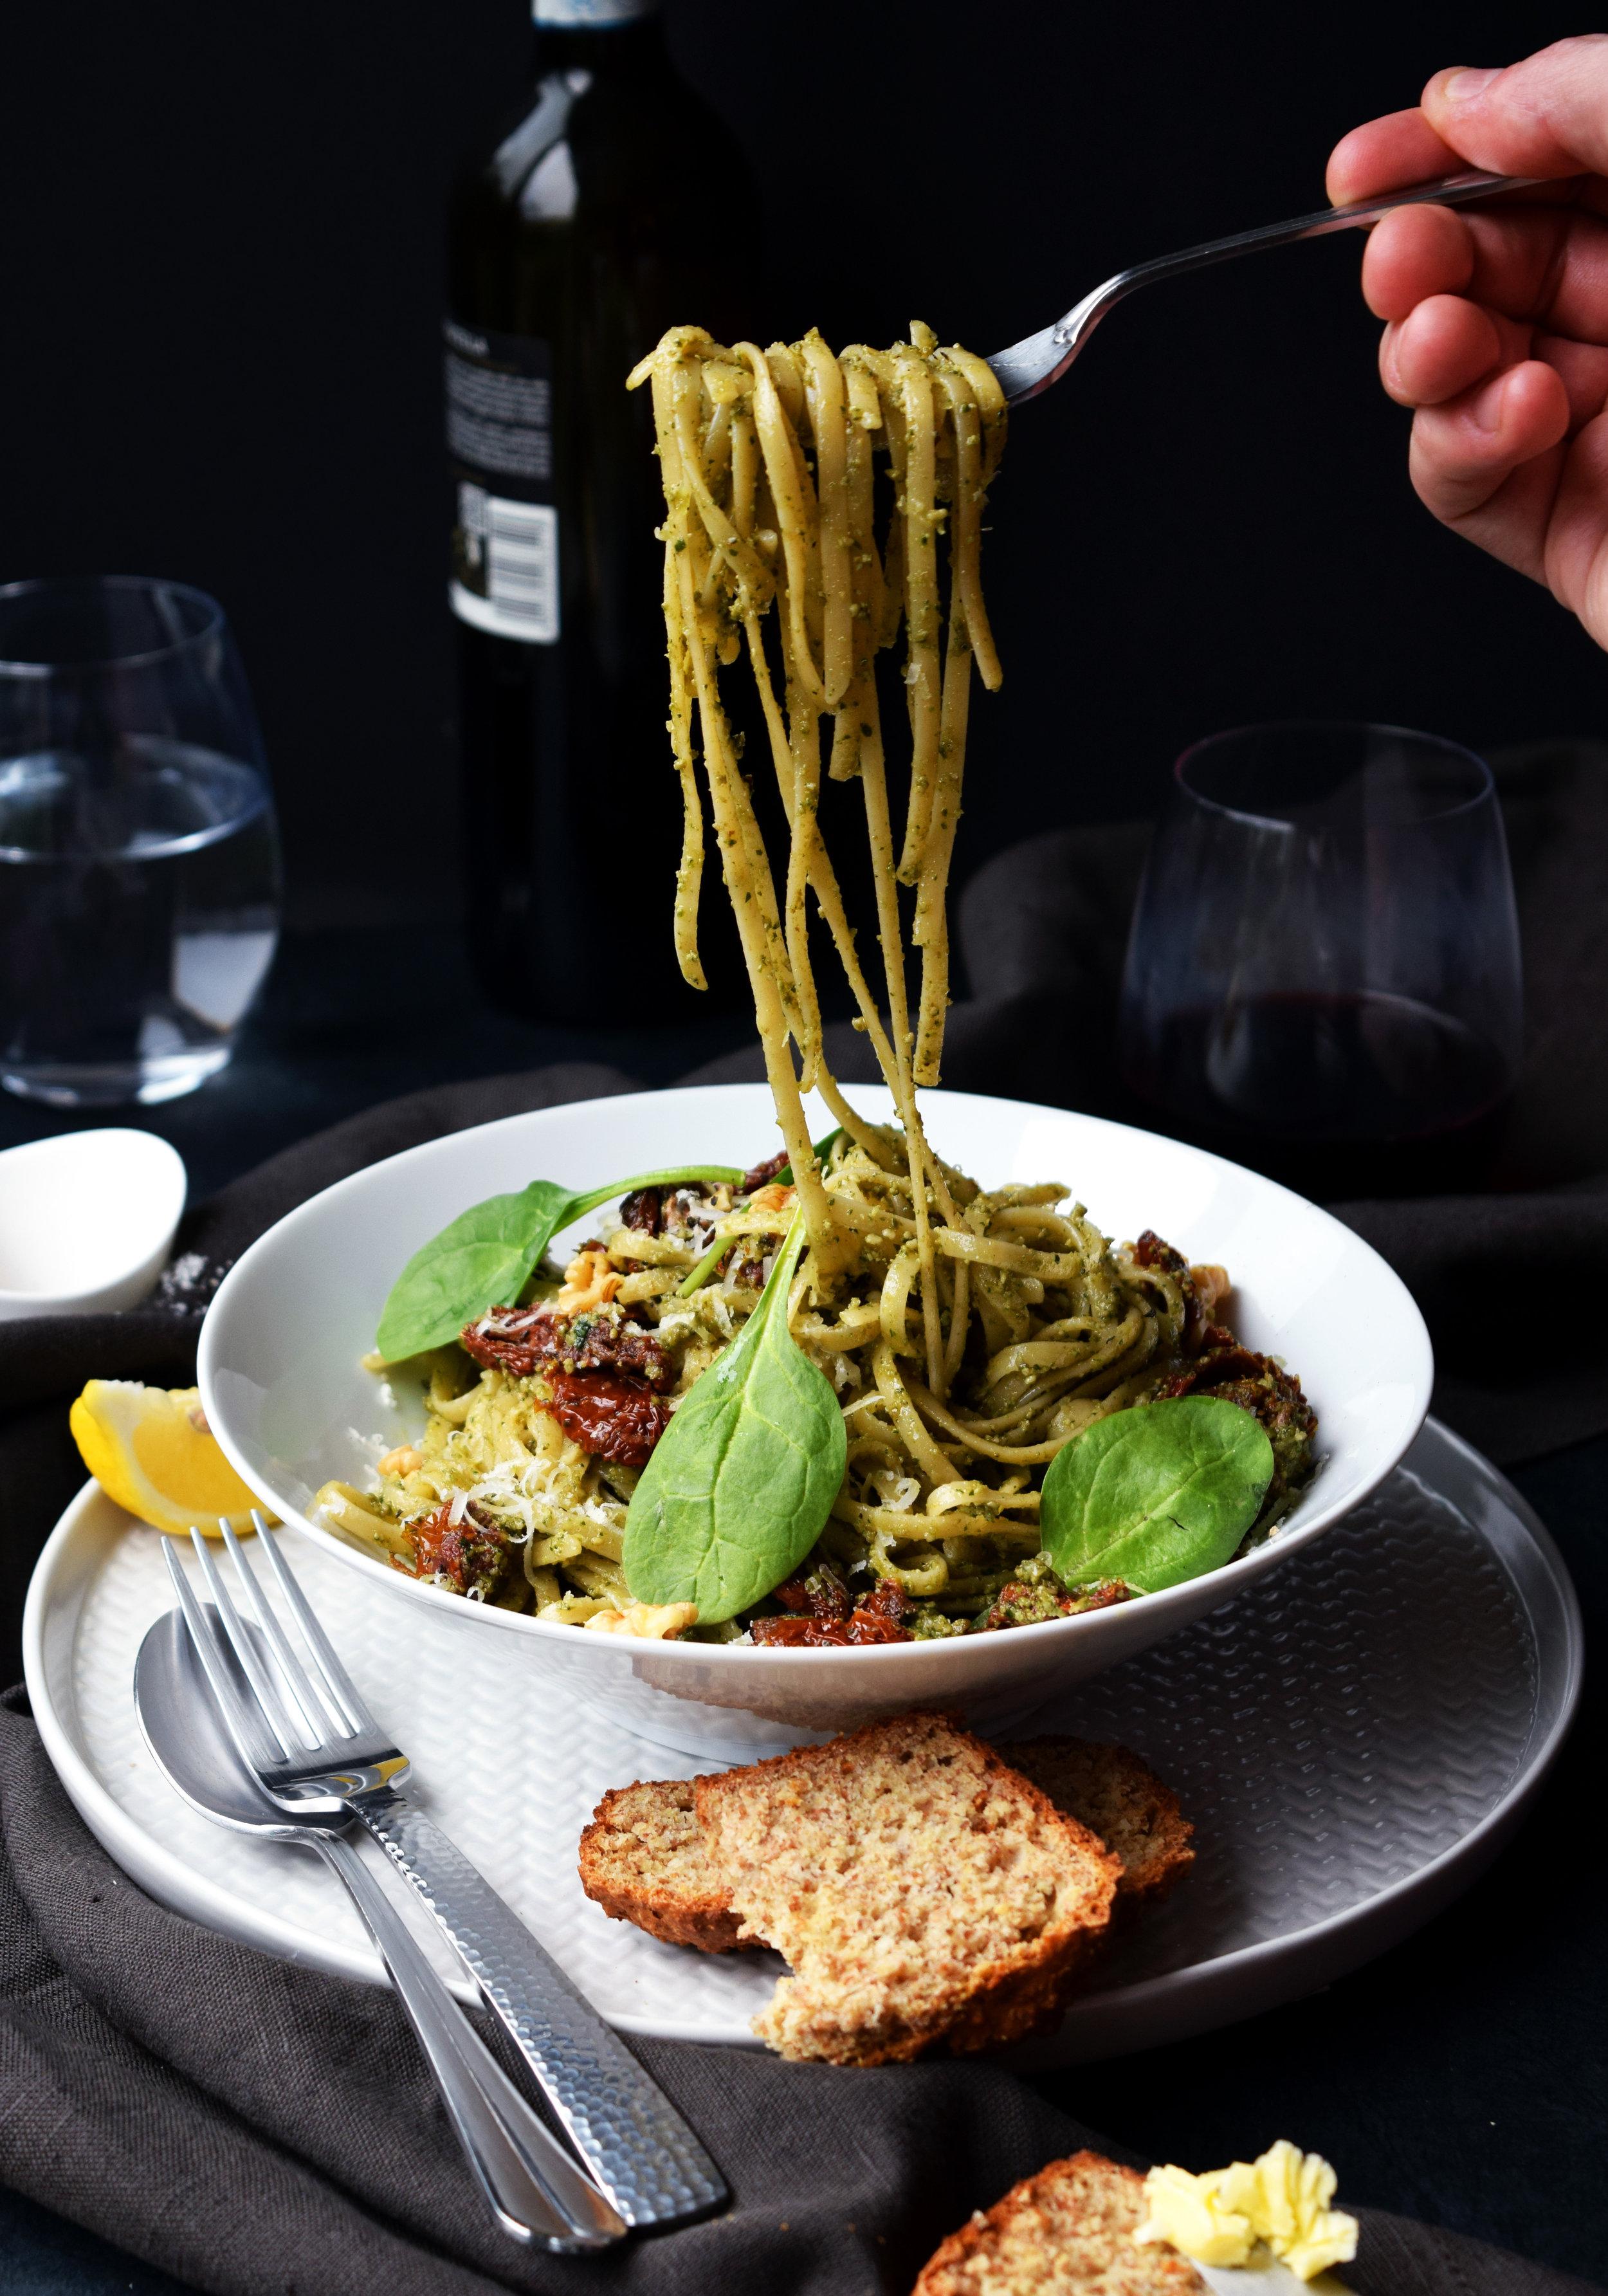 Spaghetti with spinach and walnut pesto.